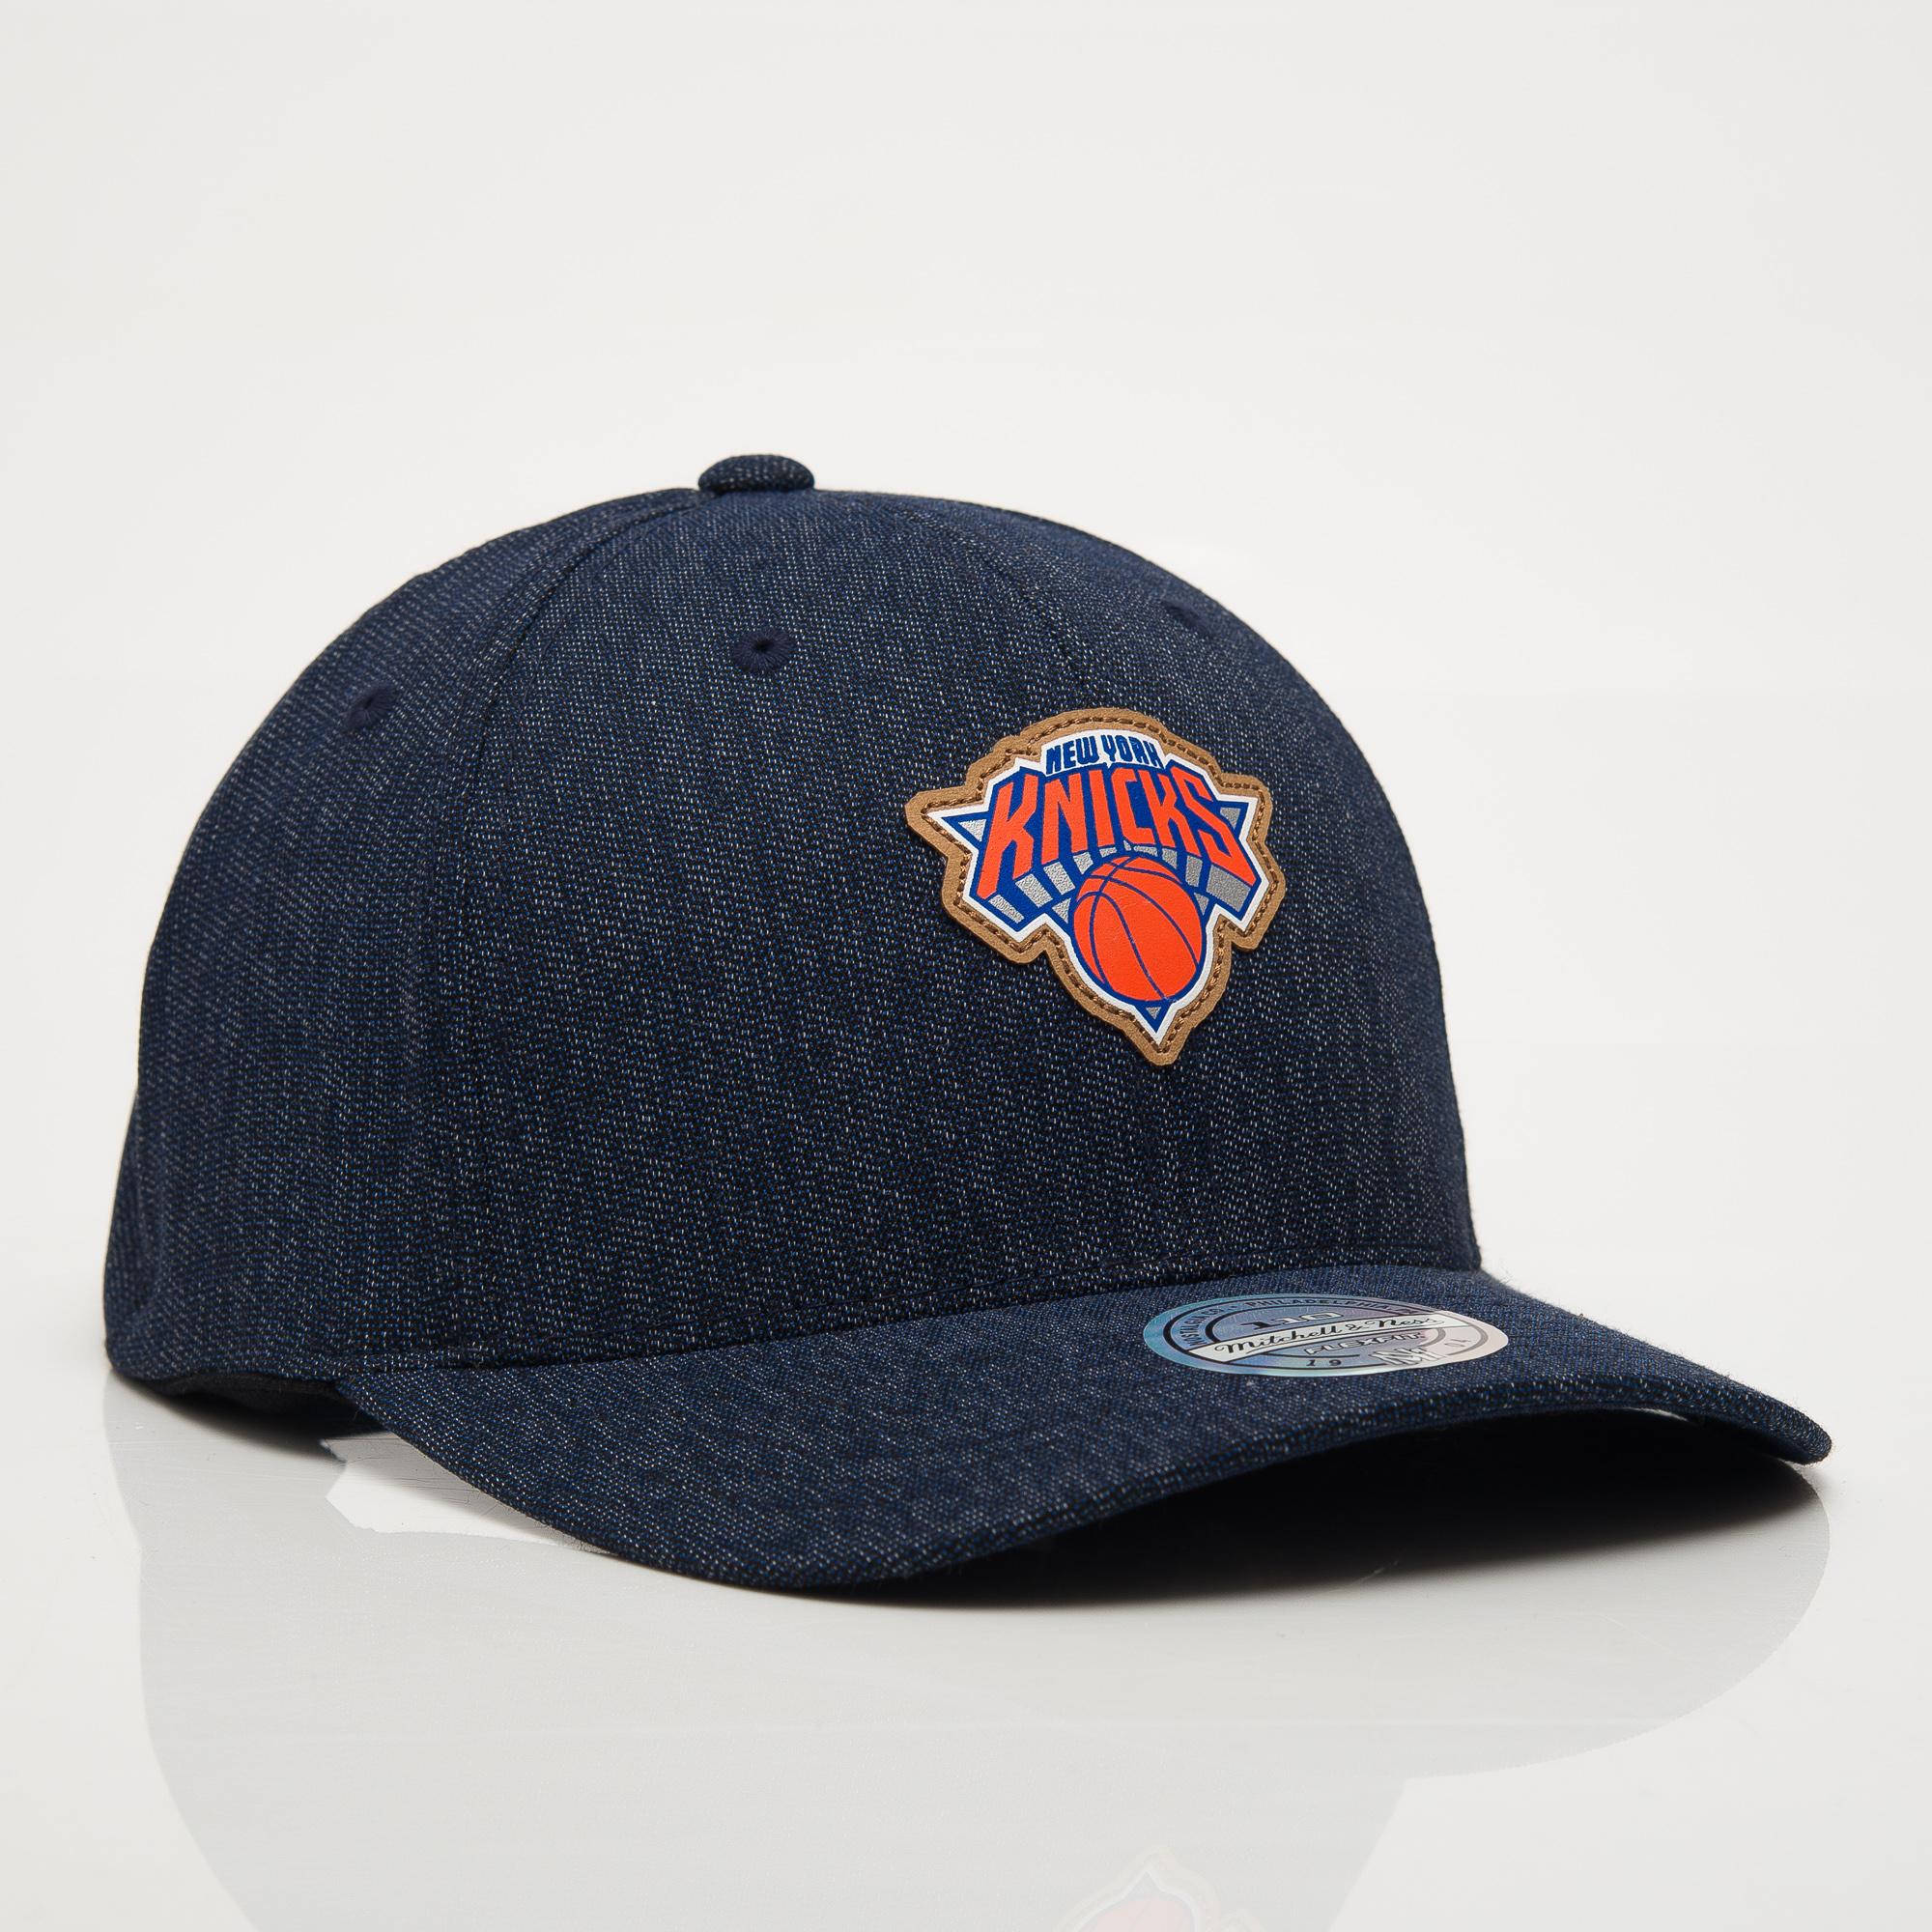 09274e9cfd1 Mitchell   Ness NBA New York Knicks Kraft 110 NBA Snapback Cap - NBA Shop  New York Knicks Merchandise - Superfanas.lt